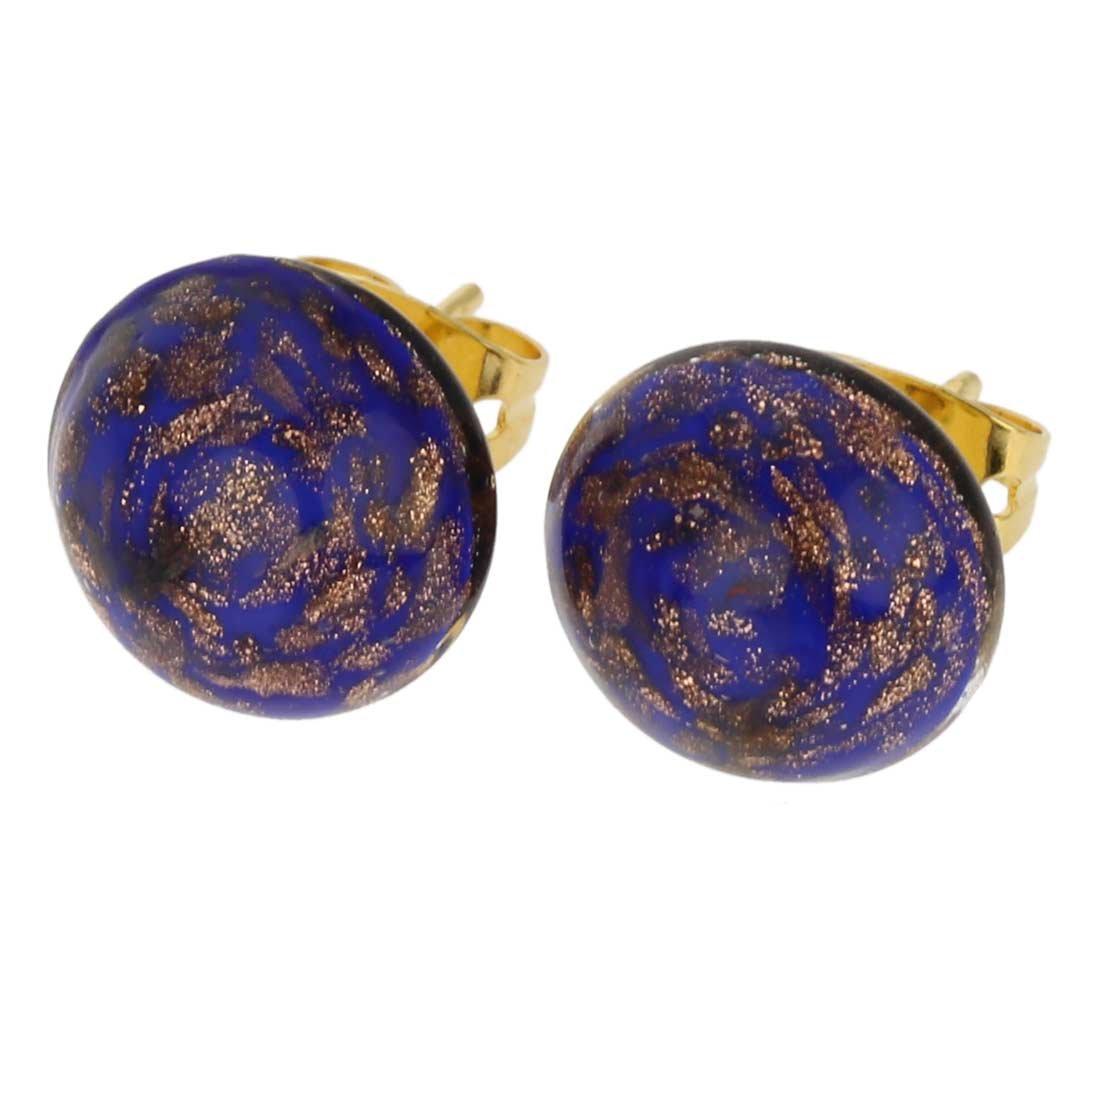 GlassOfVenice Murano Glass Starlight Small Stud Earrings - Navy Blue